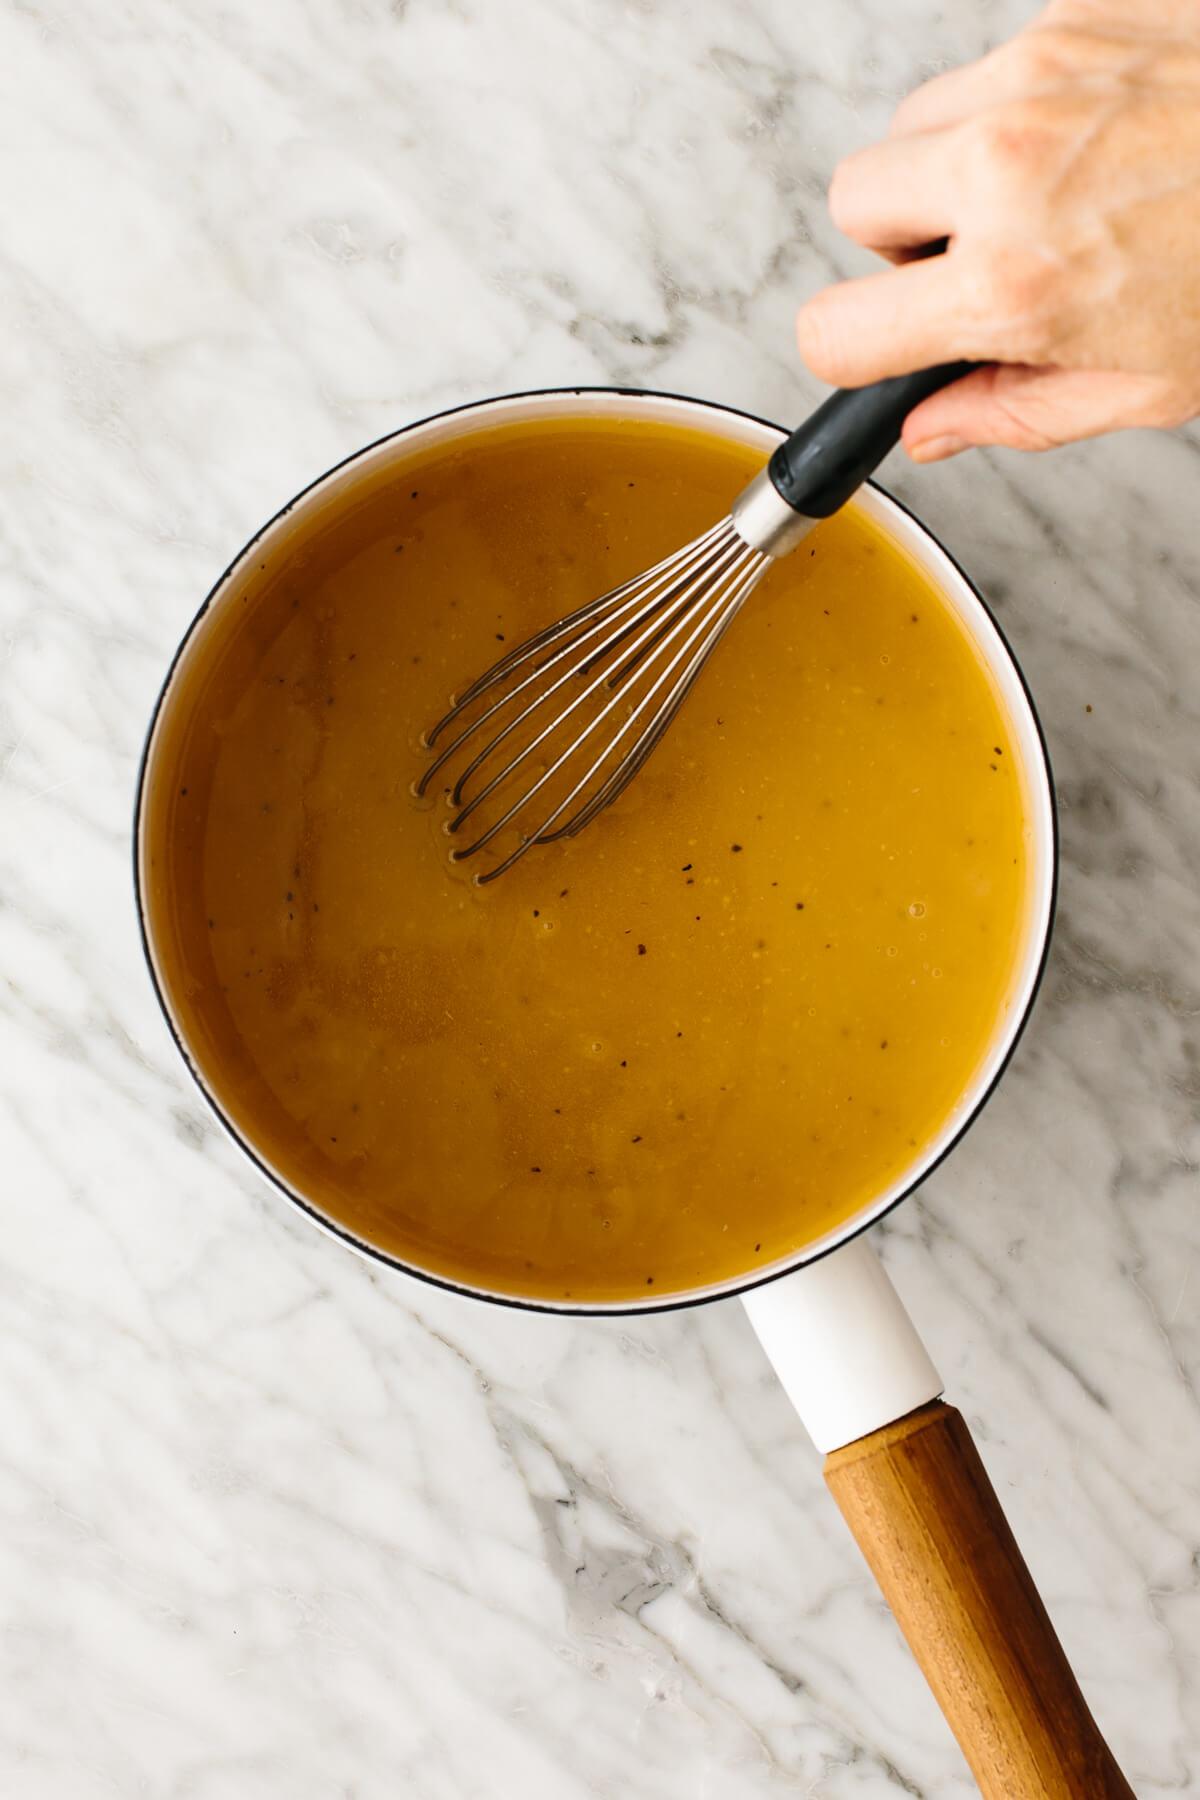 Whisking turkey gravy in a pot.